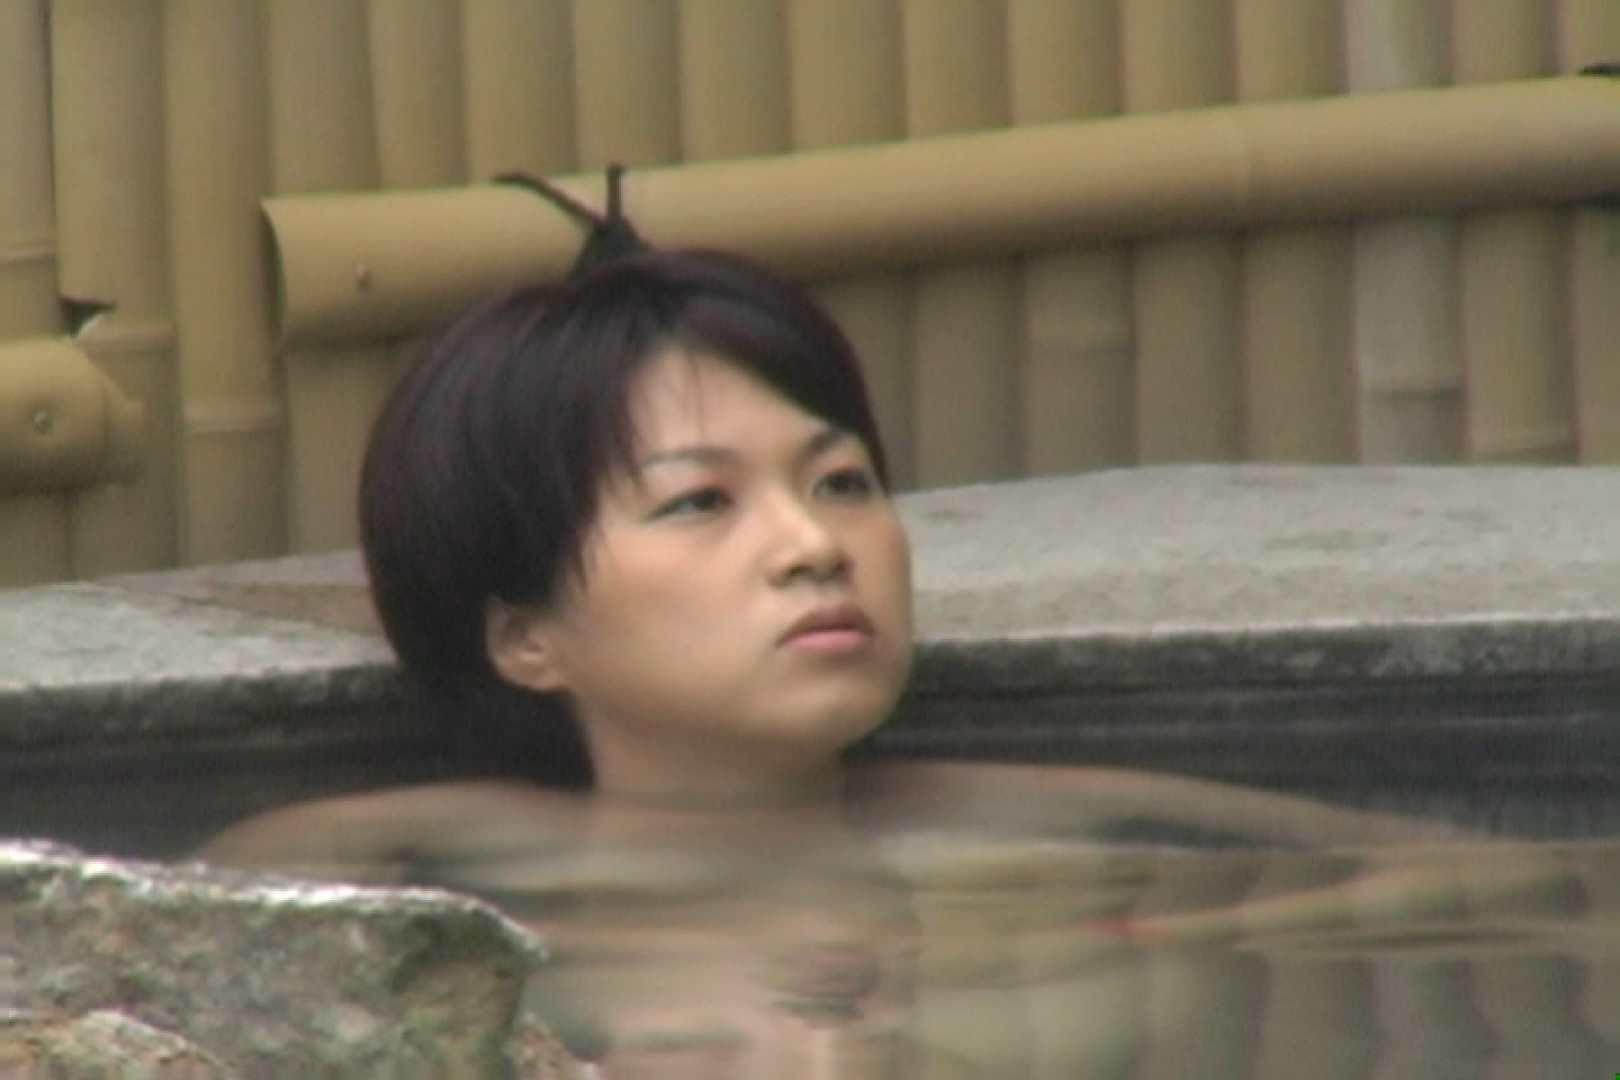 Aquaな露天風呂Vol.624 盗撮 隠し撮りオマンコ動画紹介 52画像 2